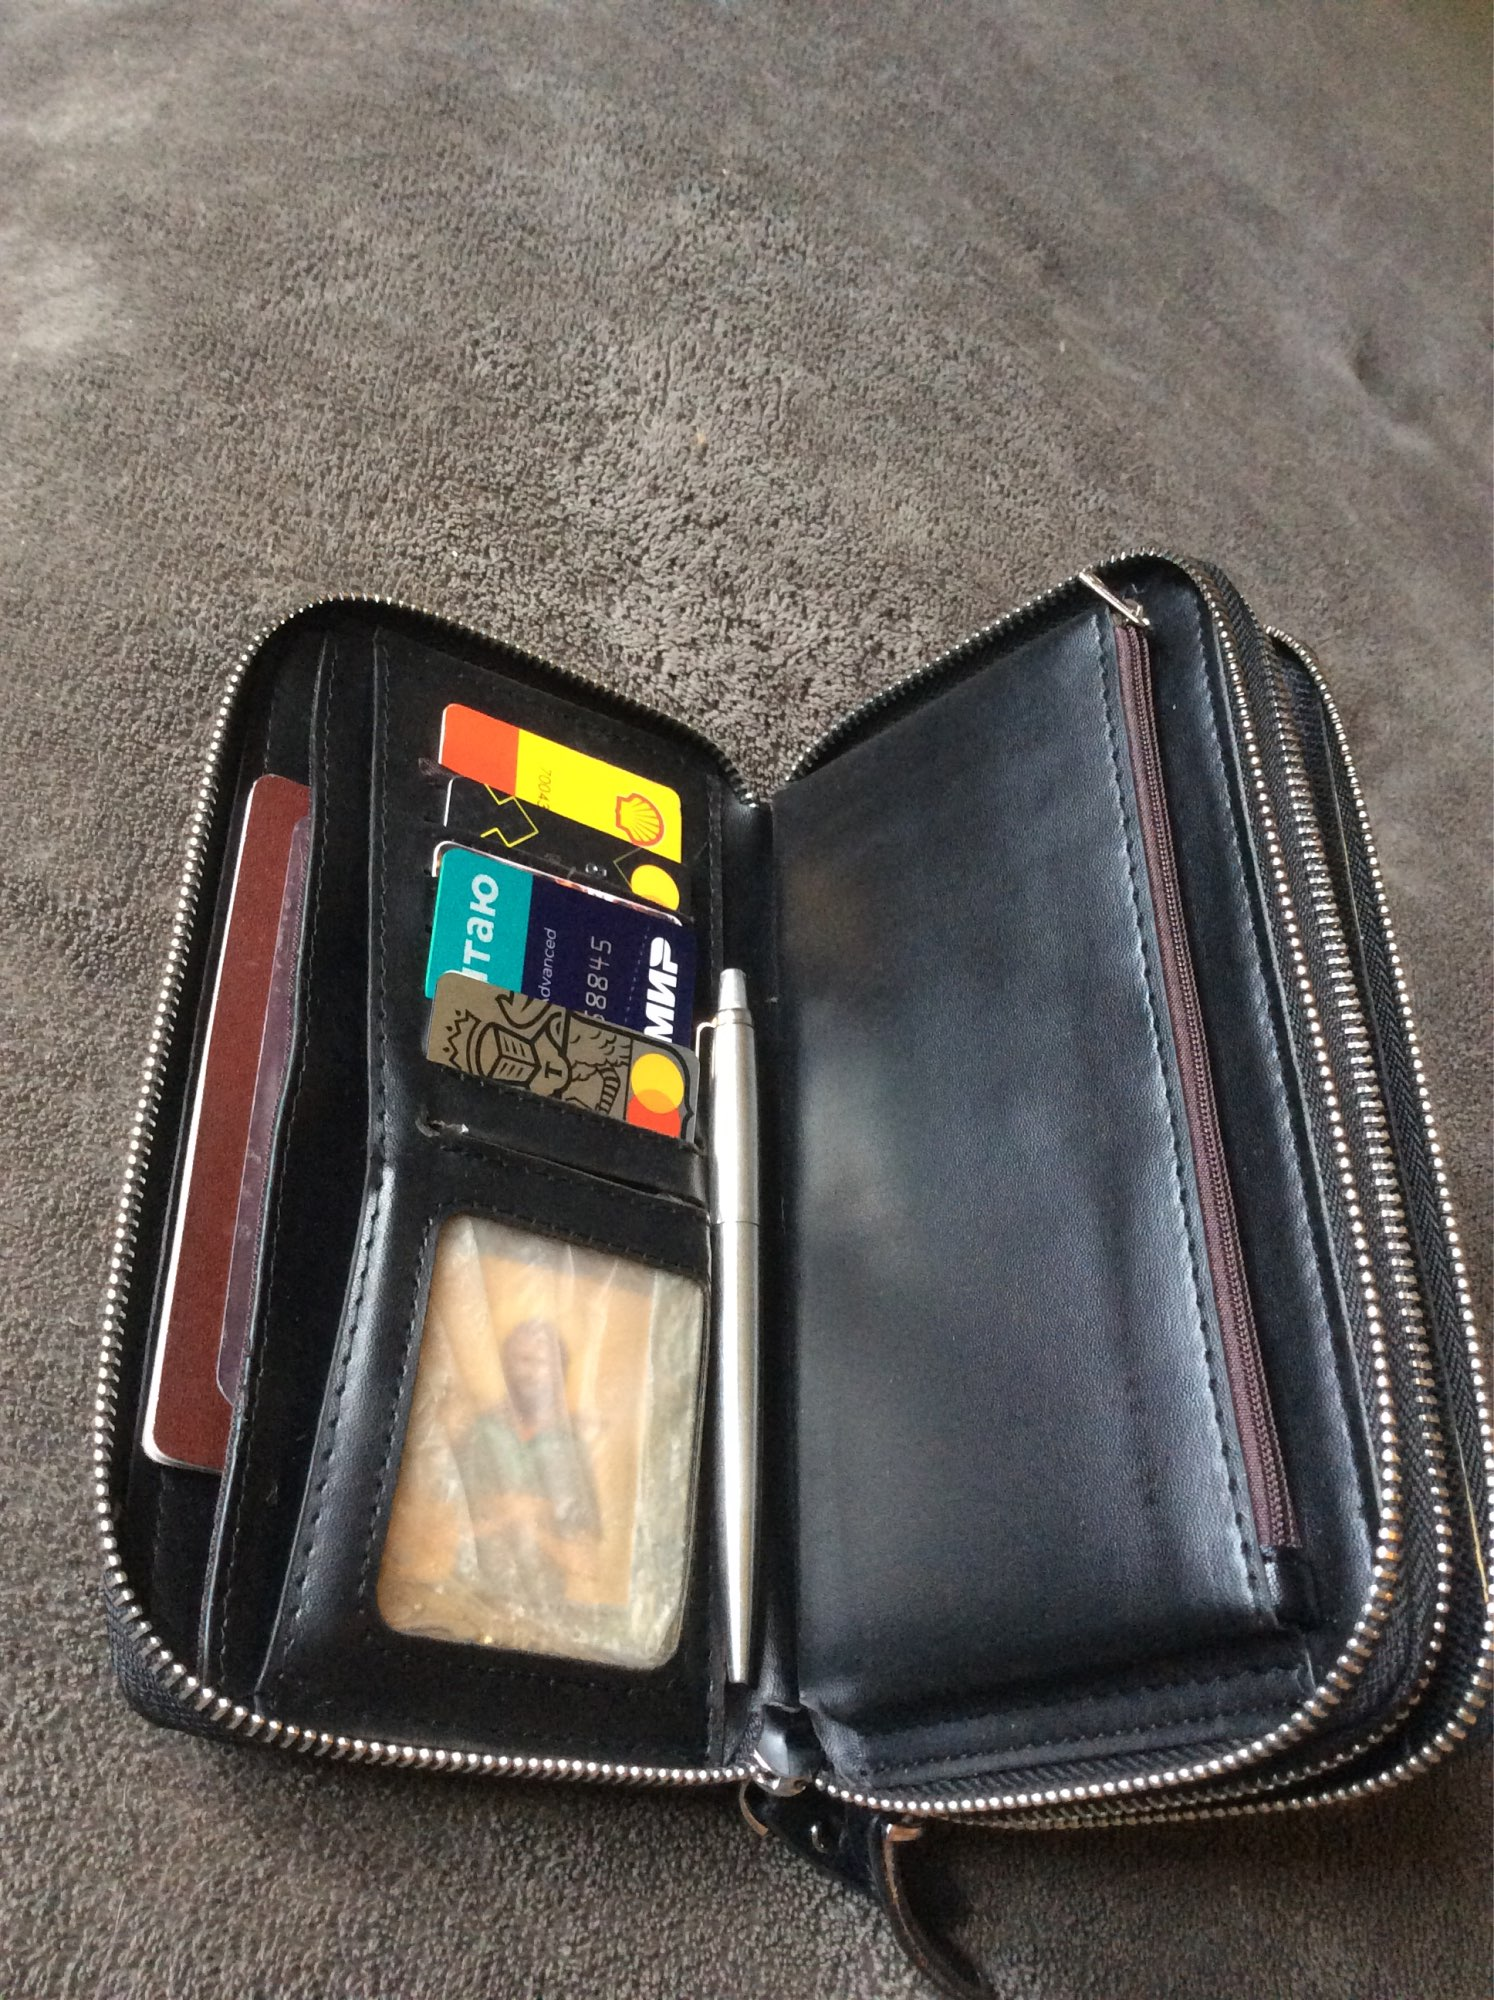 Men Wallets with Coin Pocket Long Zipper Coin Purse for Men Business Male Wallet Double Zipper Vintage Large Wallet Purse|wallet with|large walletwallet with coin pocket - AliExpress